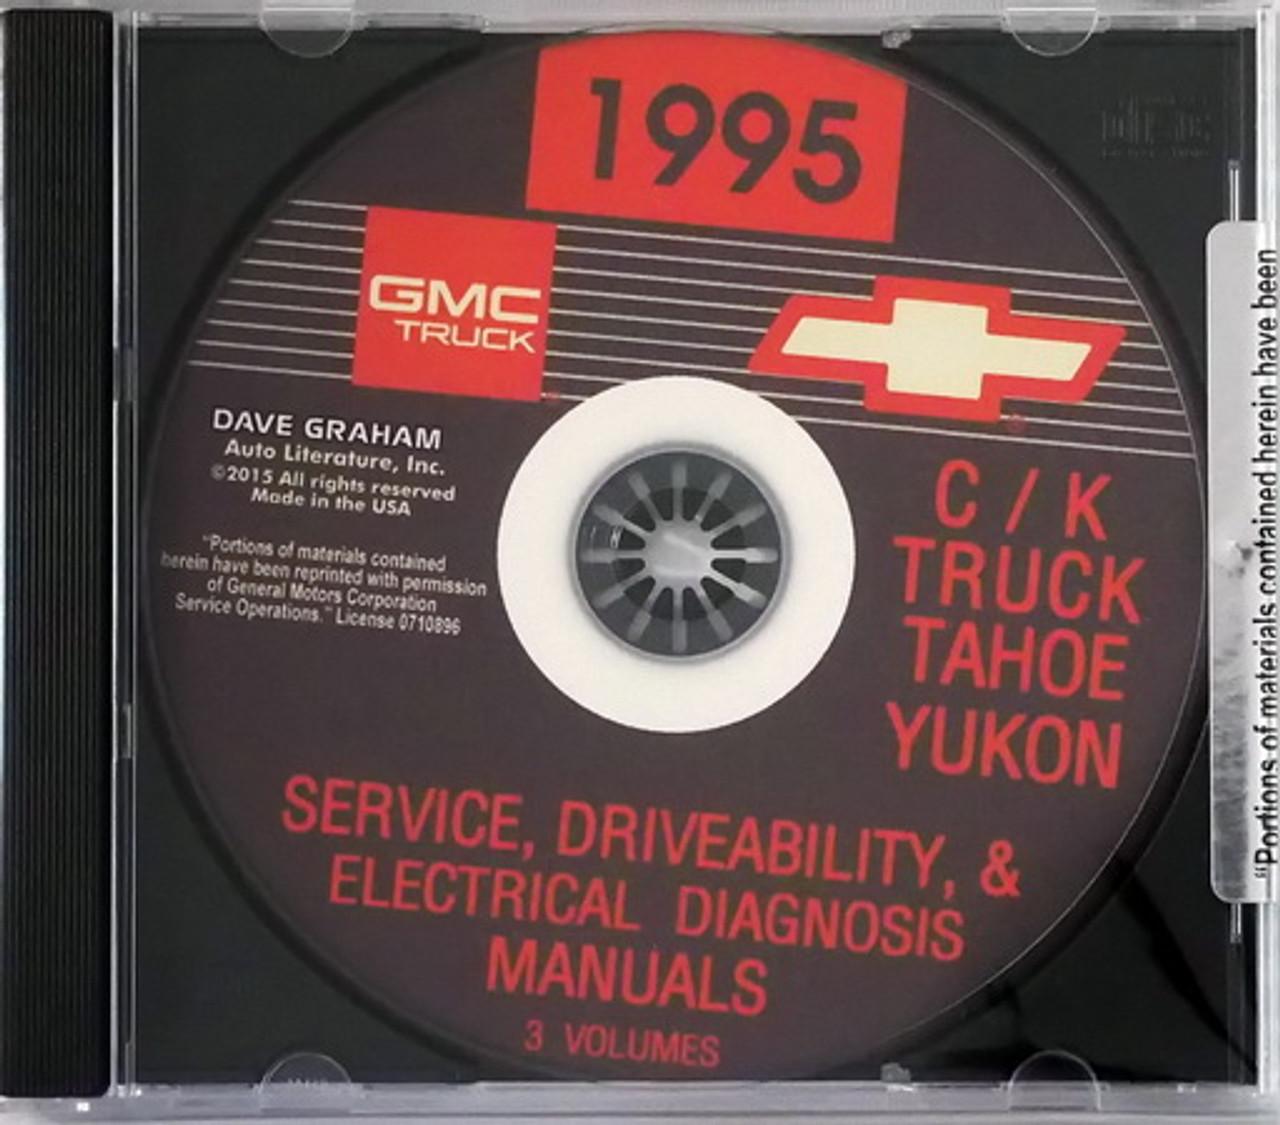 1995 Chevy Gmc C K 1500 3500 Truck Tahoe Suburban Yukon Shop Service Manual Cd Factory Repair Manuals